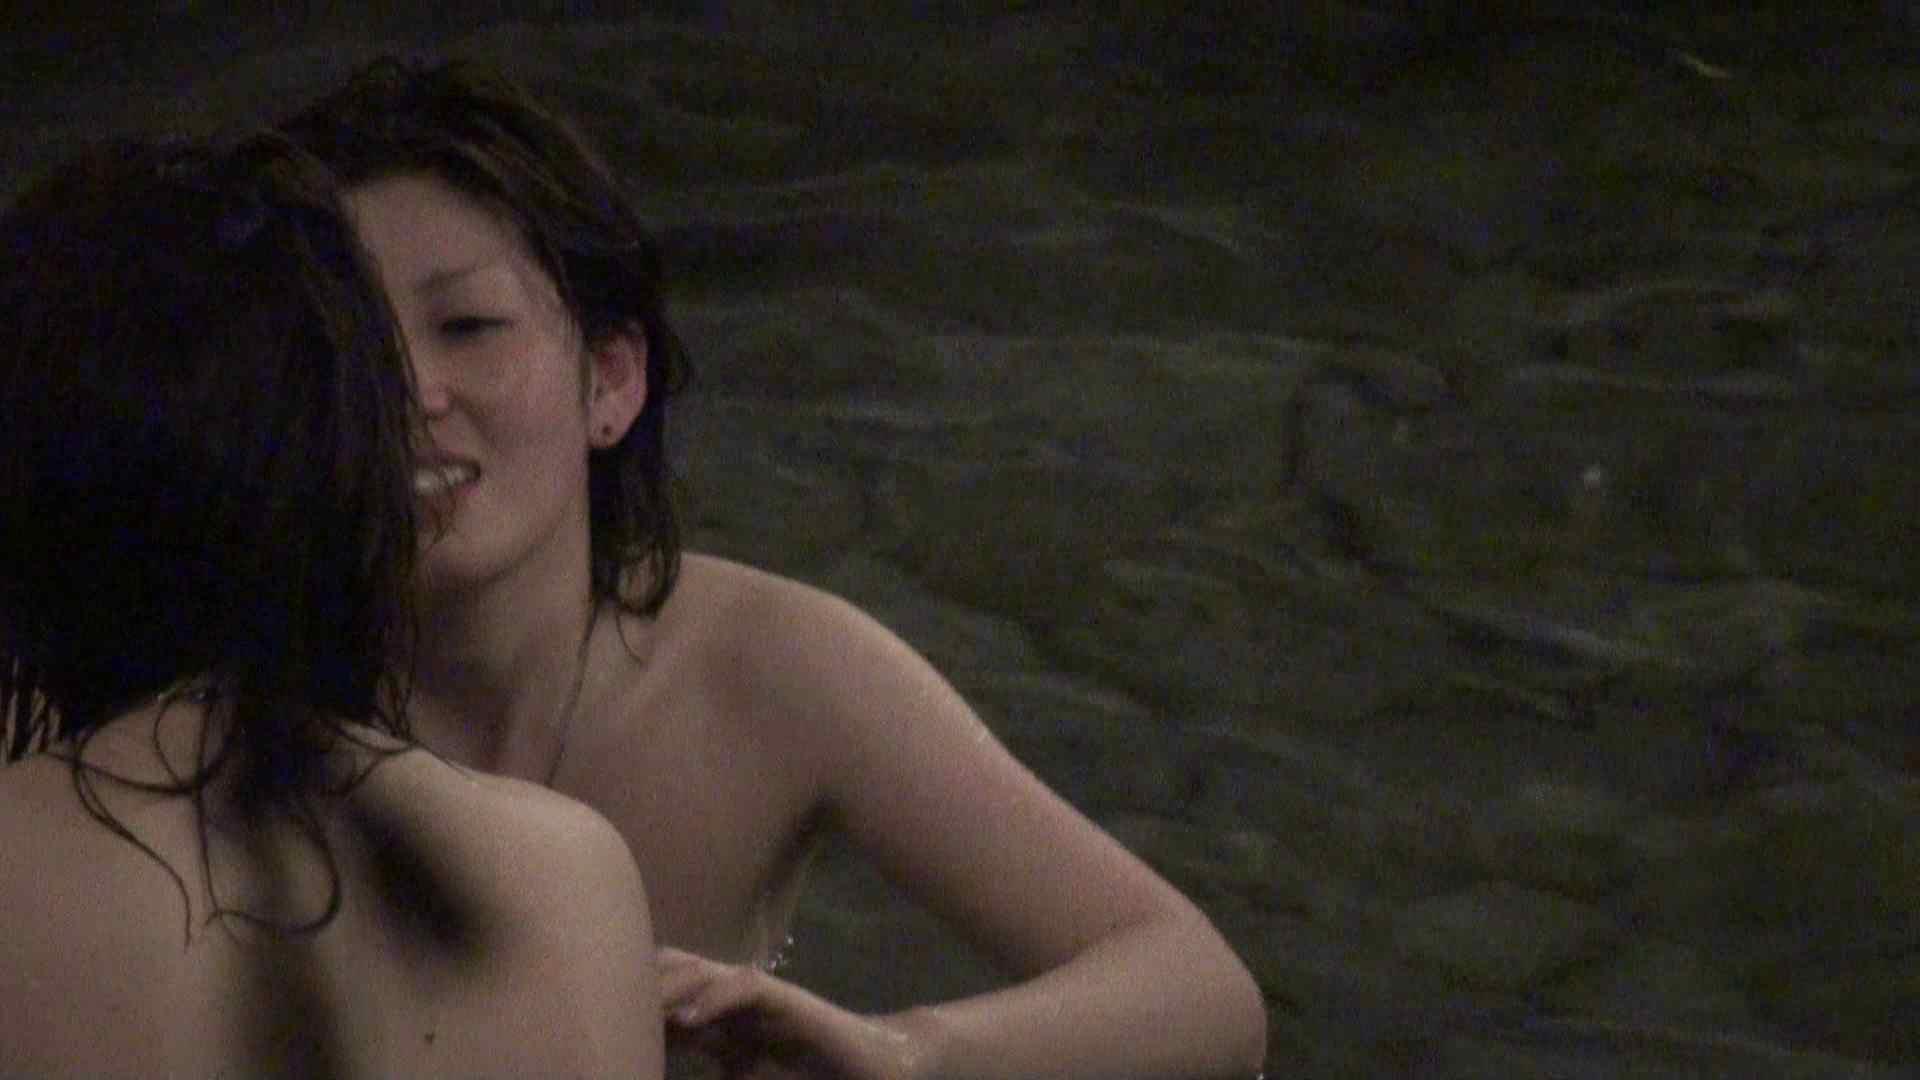 Aquaな露天風呂Vol.376 いやらしいOL われめAV動画紹介 33連発 17